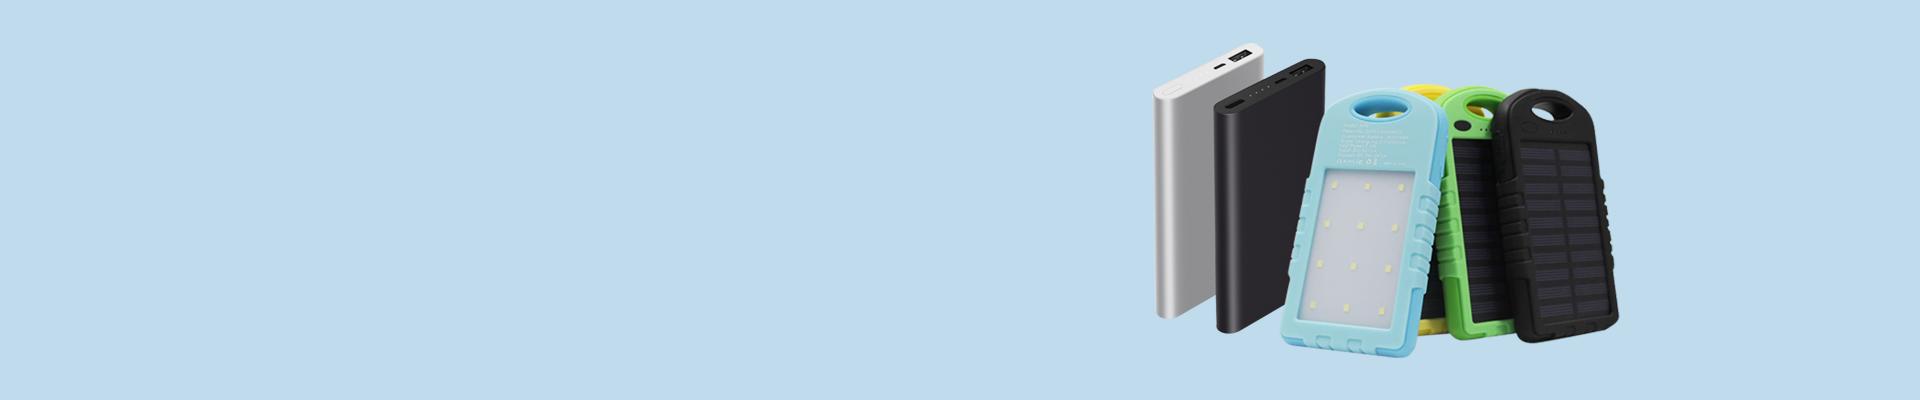 Jual Power Bank Merk Terbaik & Lengkap - Harga Power Bank Murah